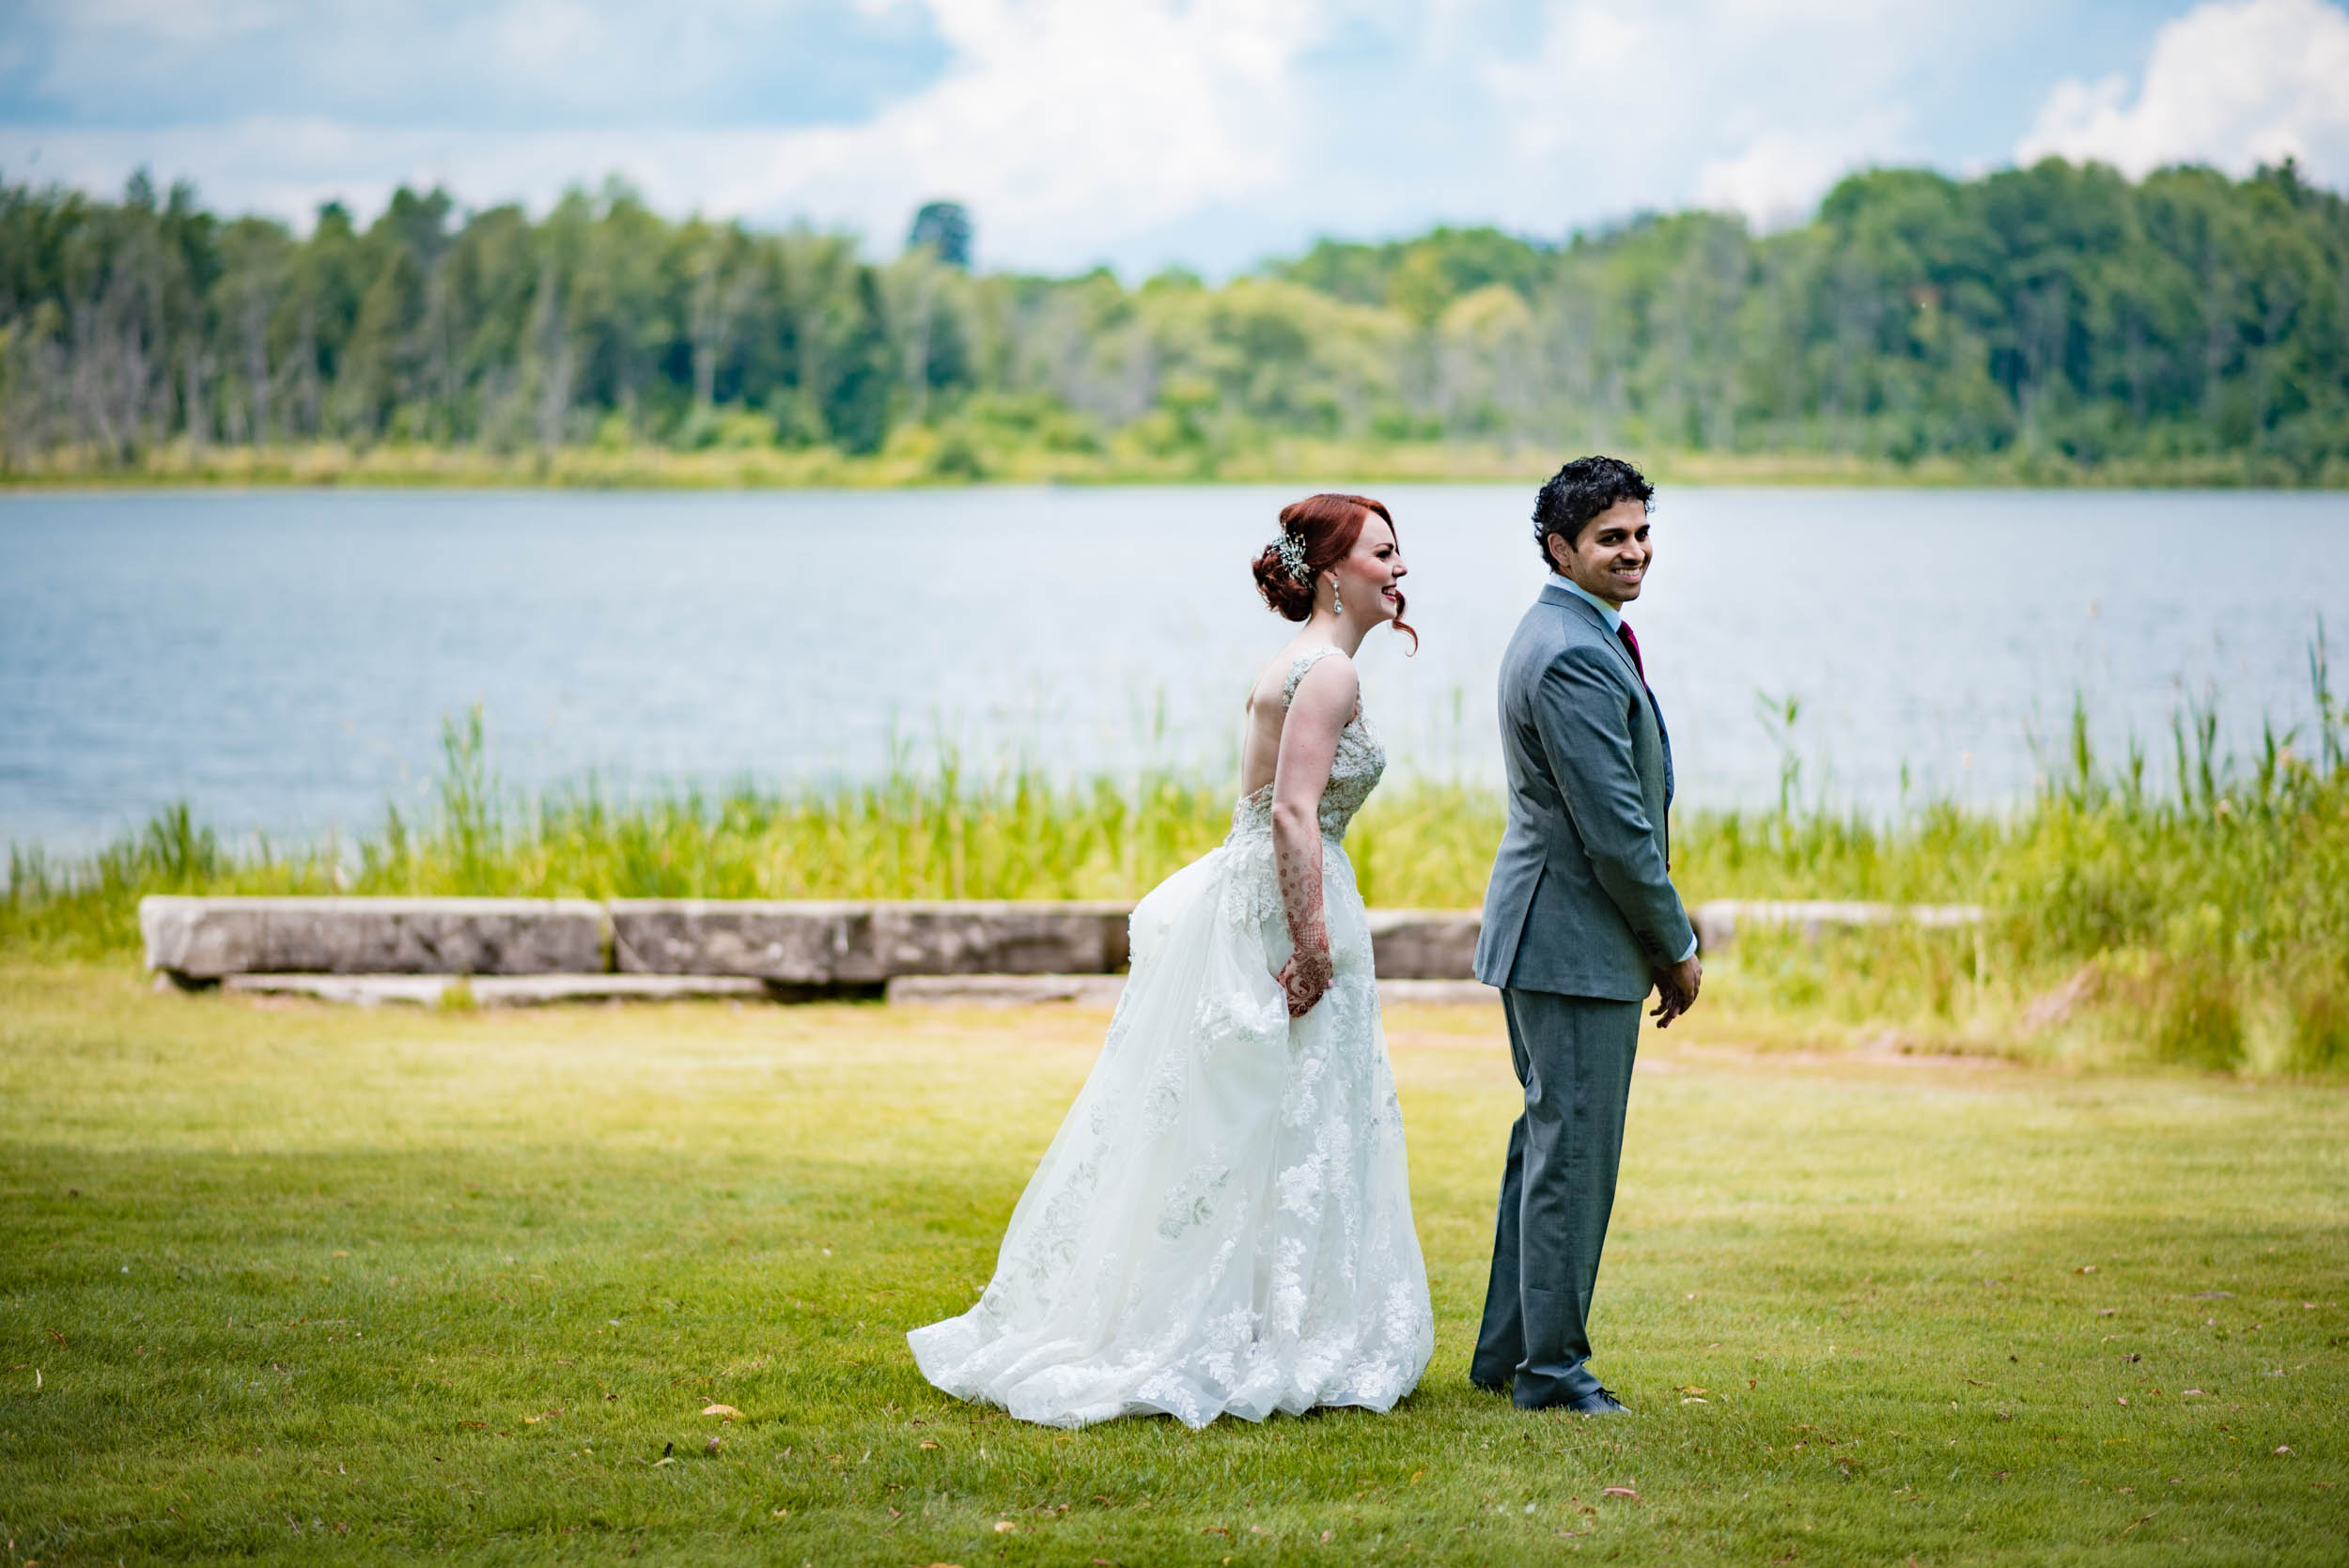 luxury-indian-wedding-royal-ambassador-toronto (9).jpg